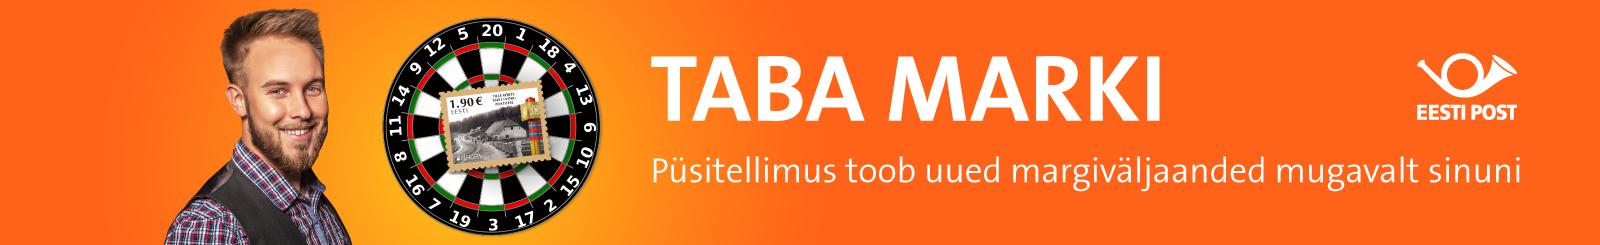 Tabamarki_uus